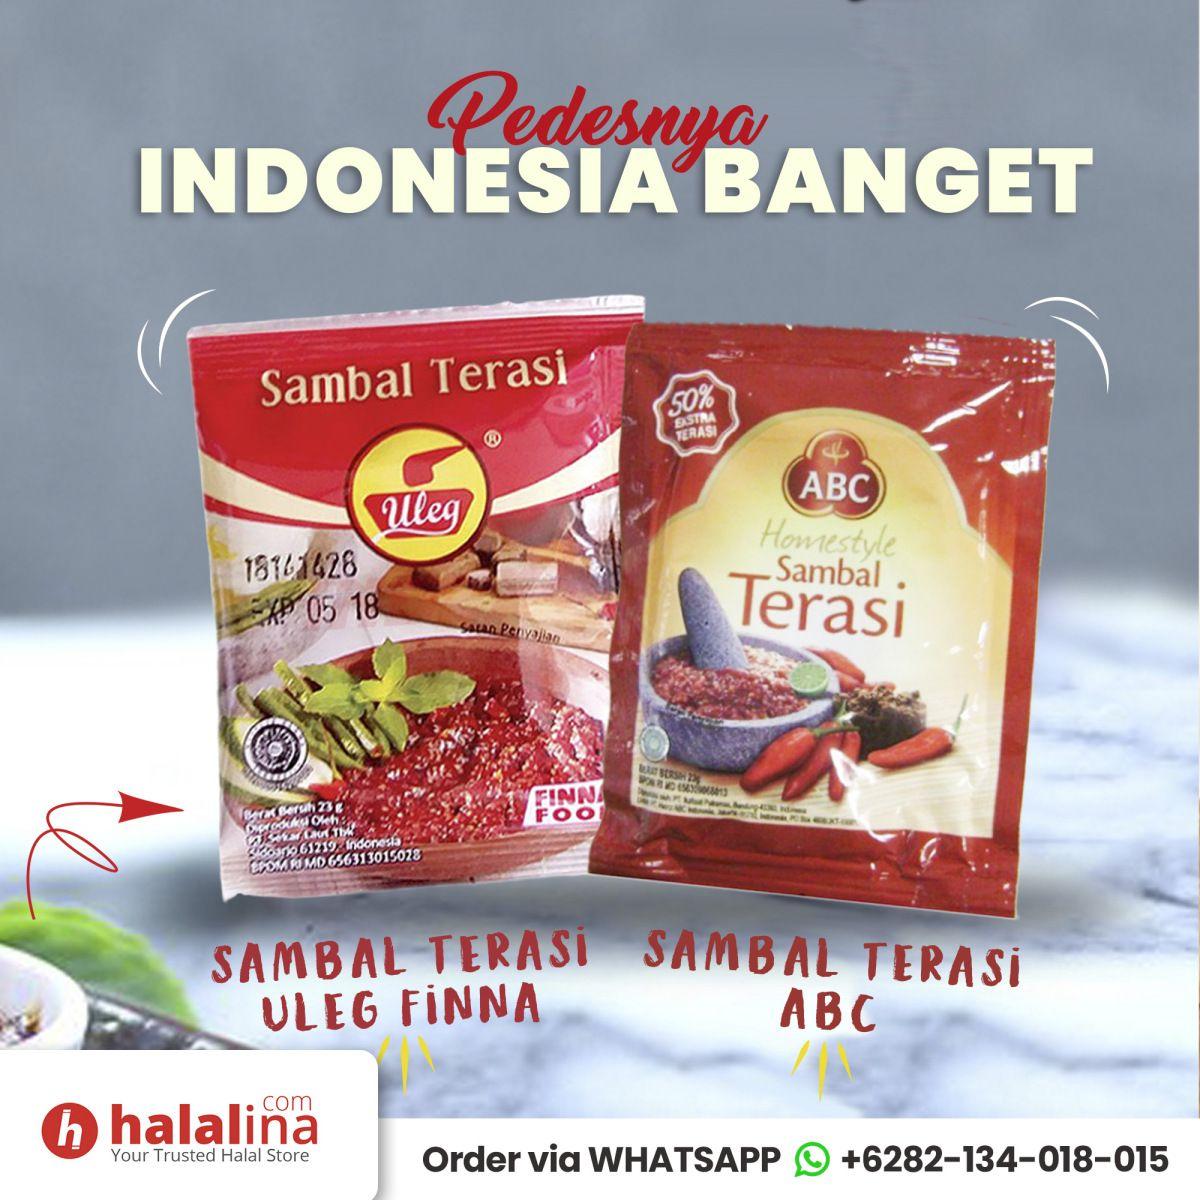 Halalina Phone 62 821 3401 8015 Halal Food In Tokyo In Japan In 2020 Halal Recipes Halal Snacks Halal